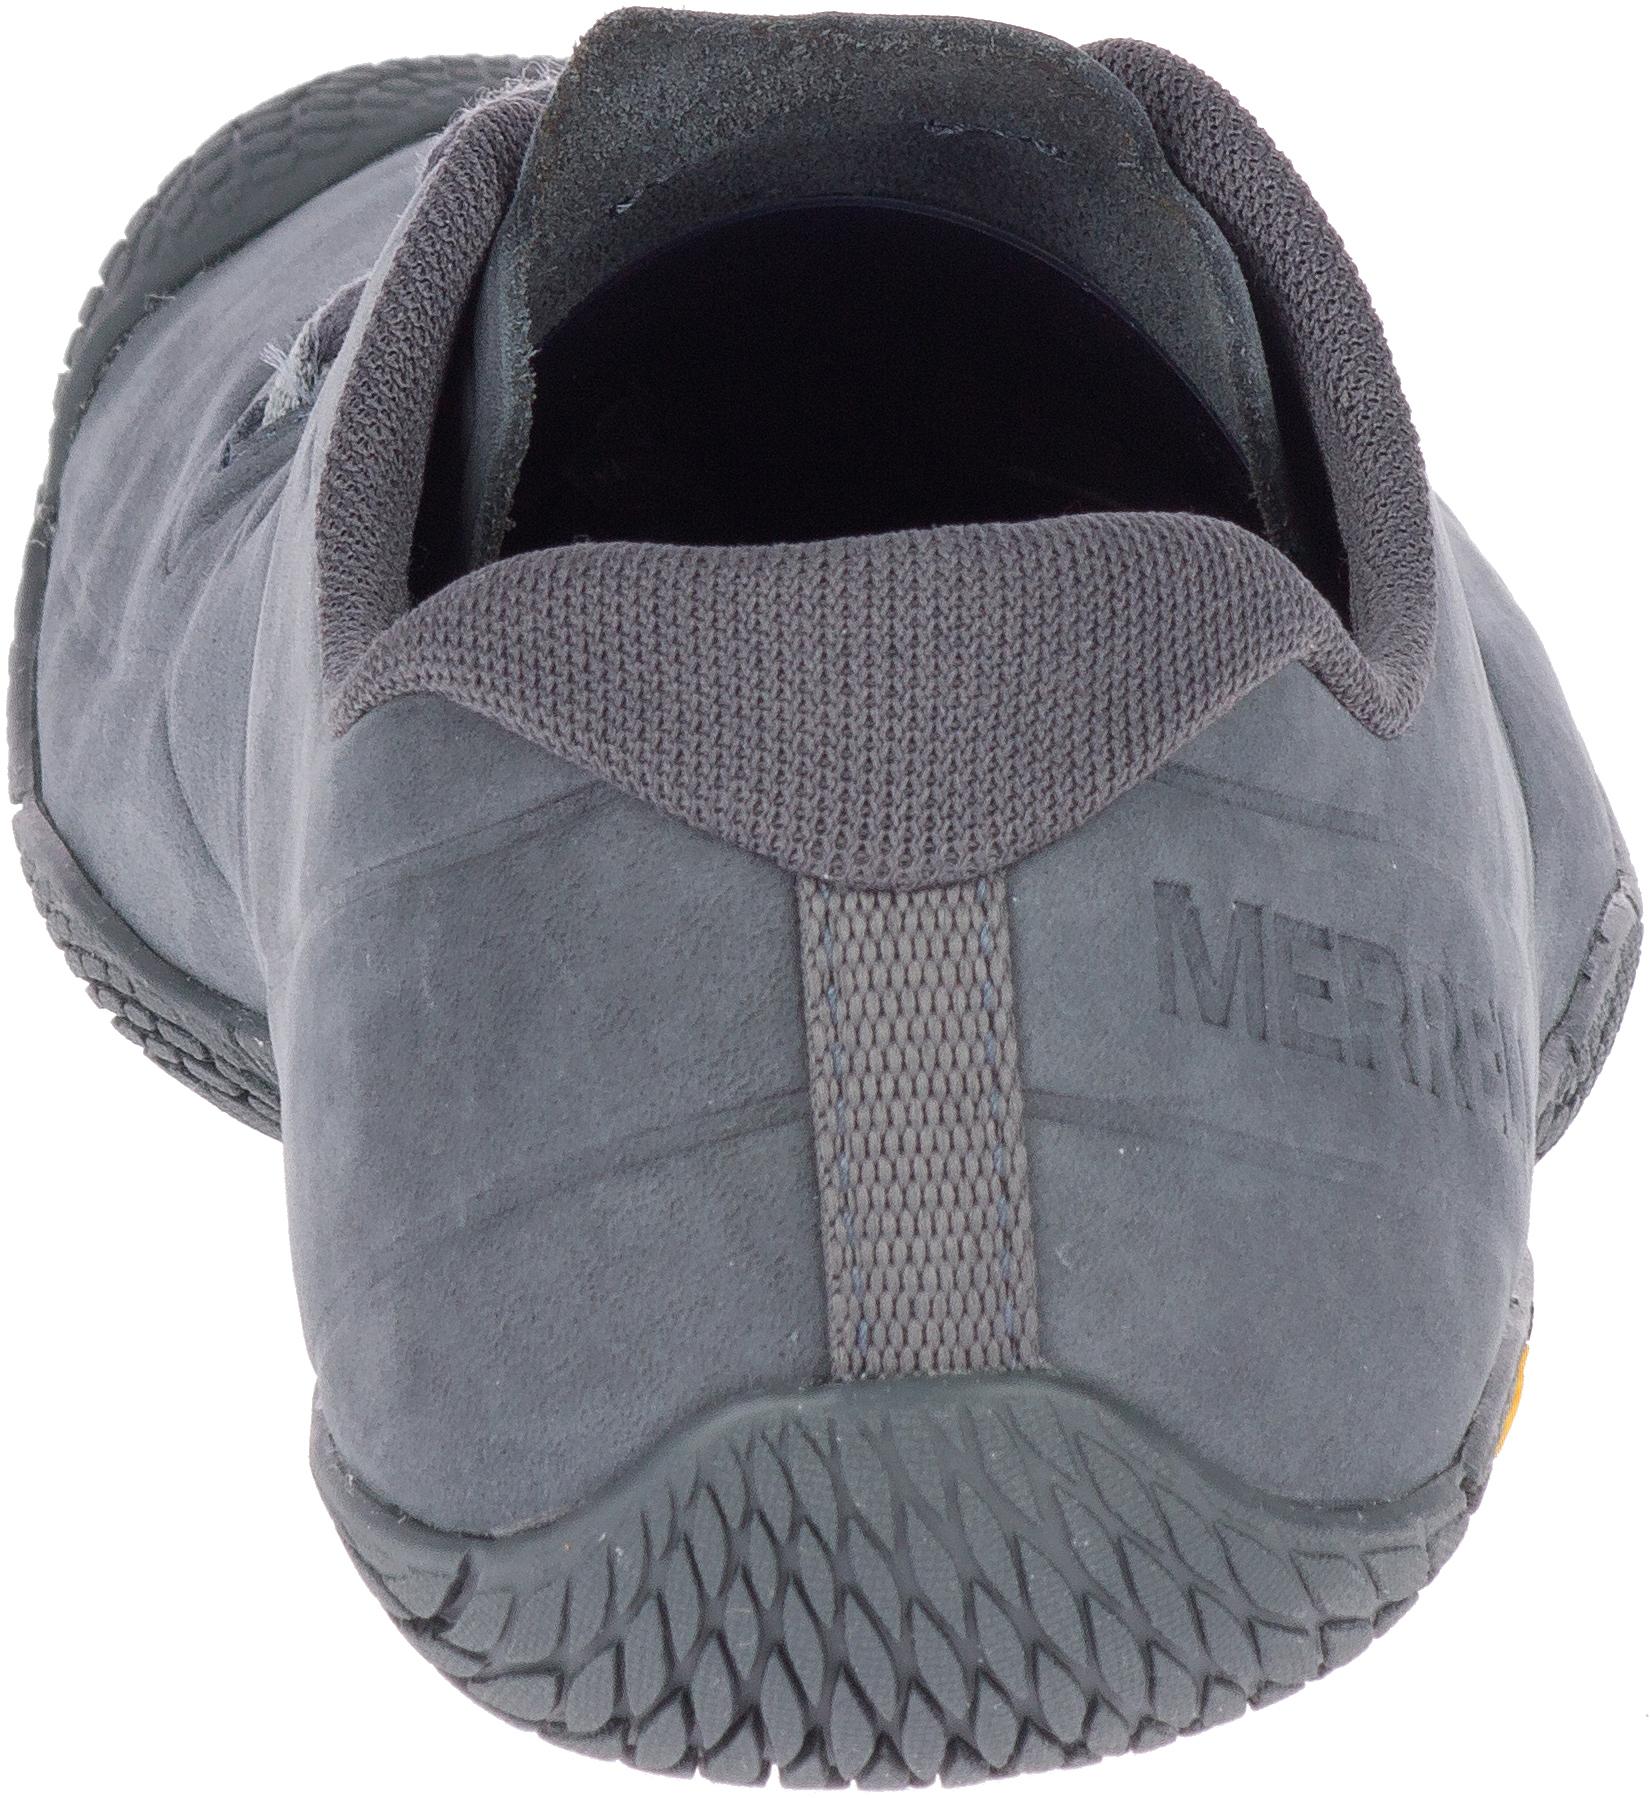 Vapor Glove Luna 3 Leather, Granite